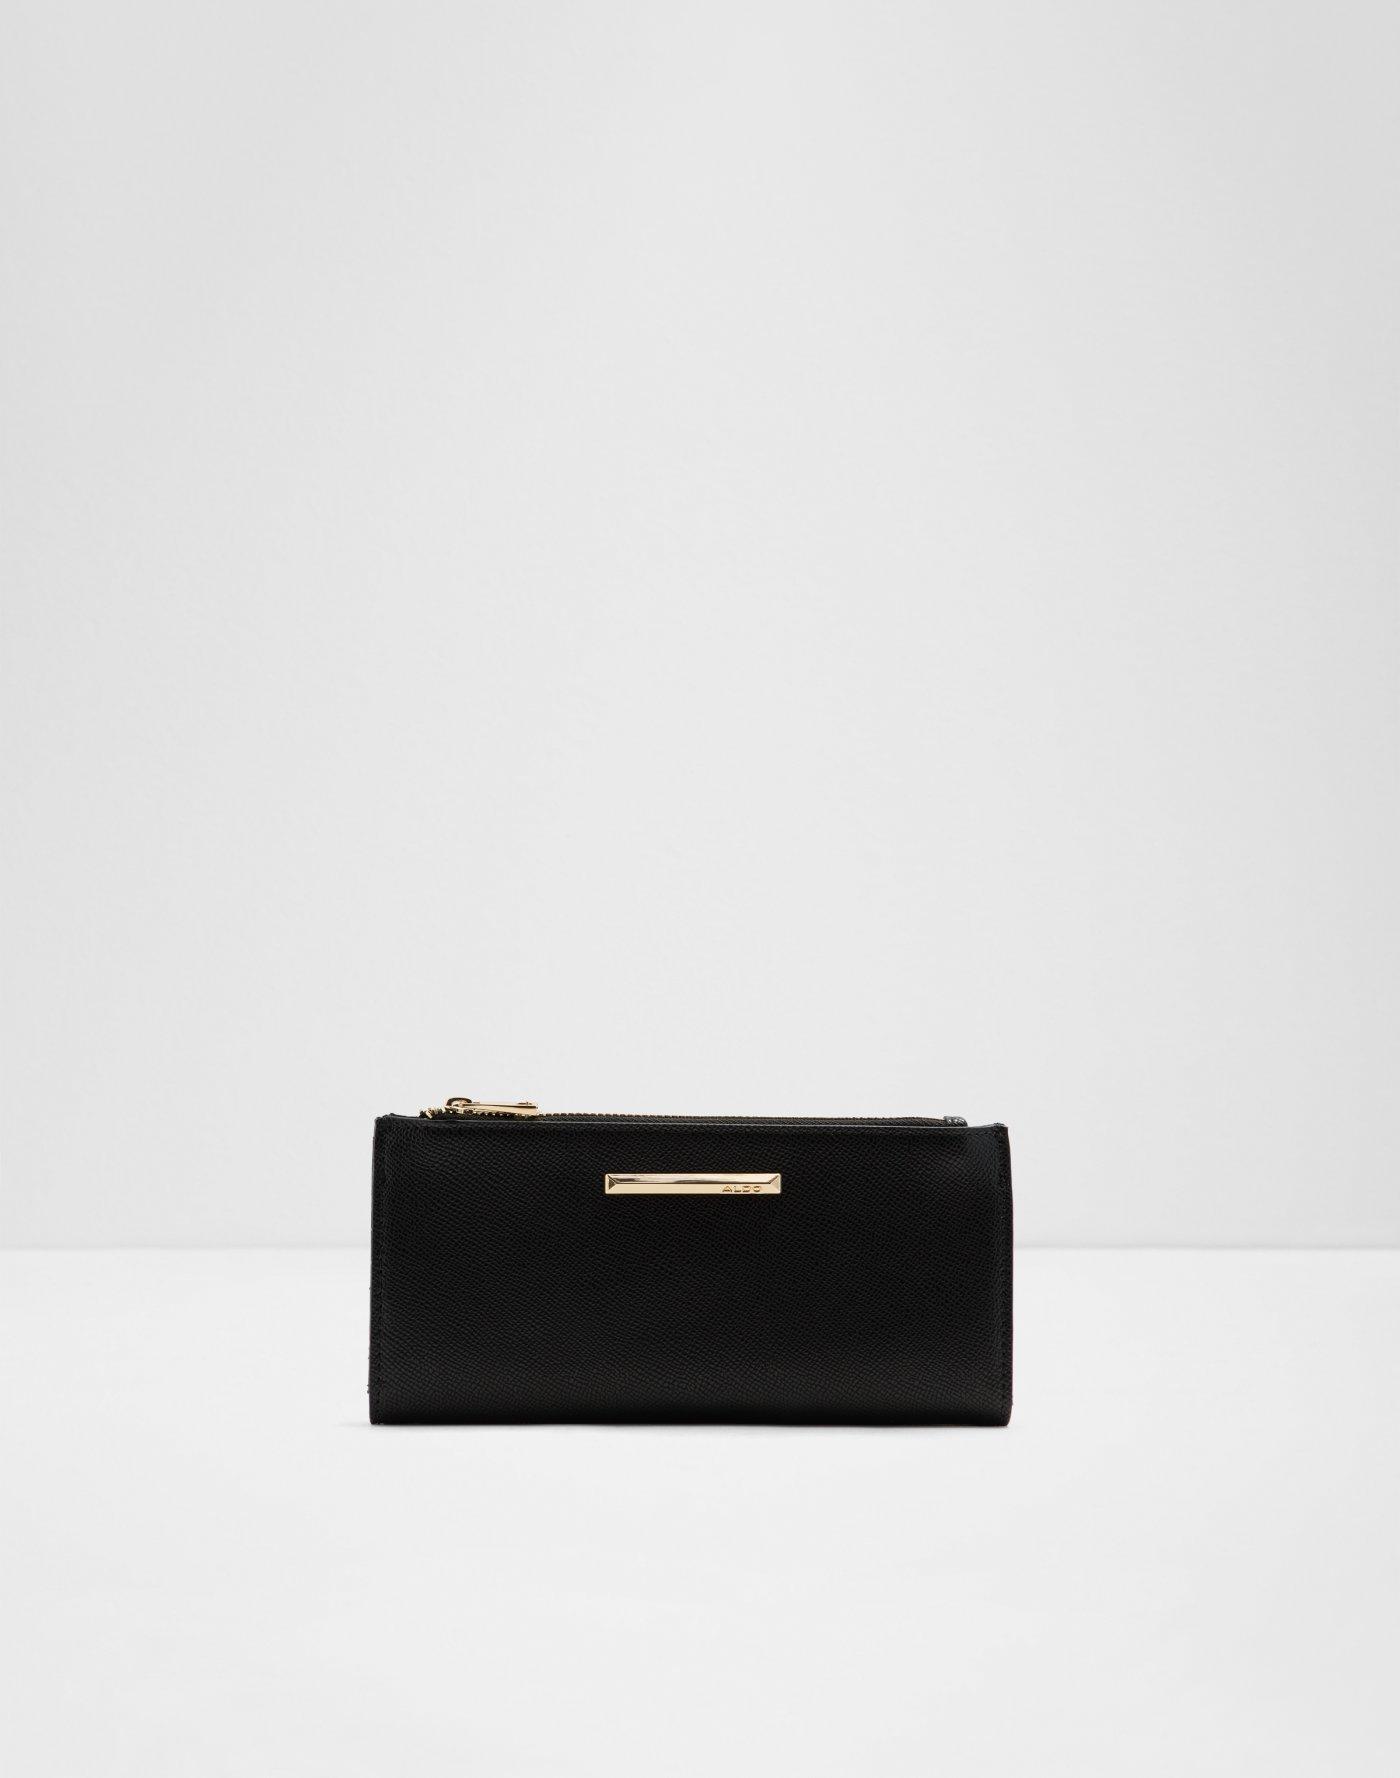 3f478c42ef7 Handbags on Sale for Women | ALDO Canada | ALDO Canada